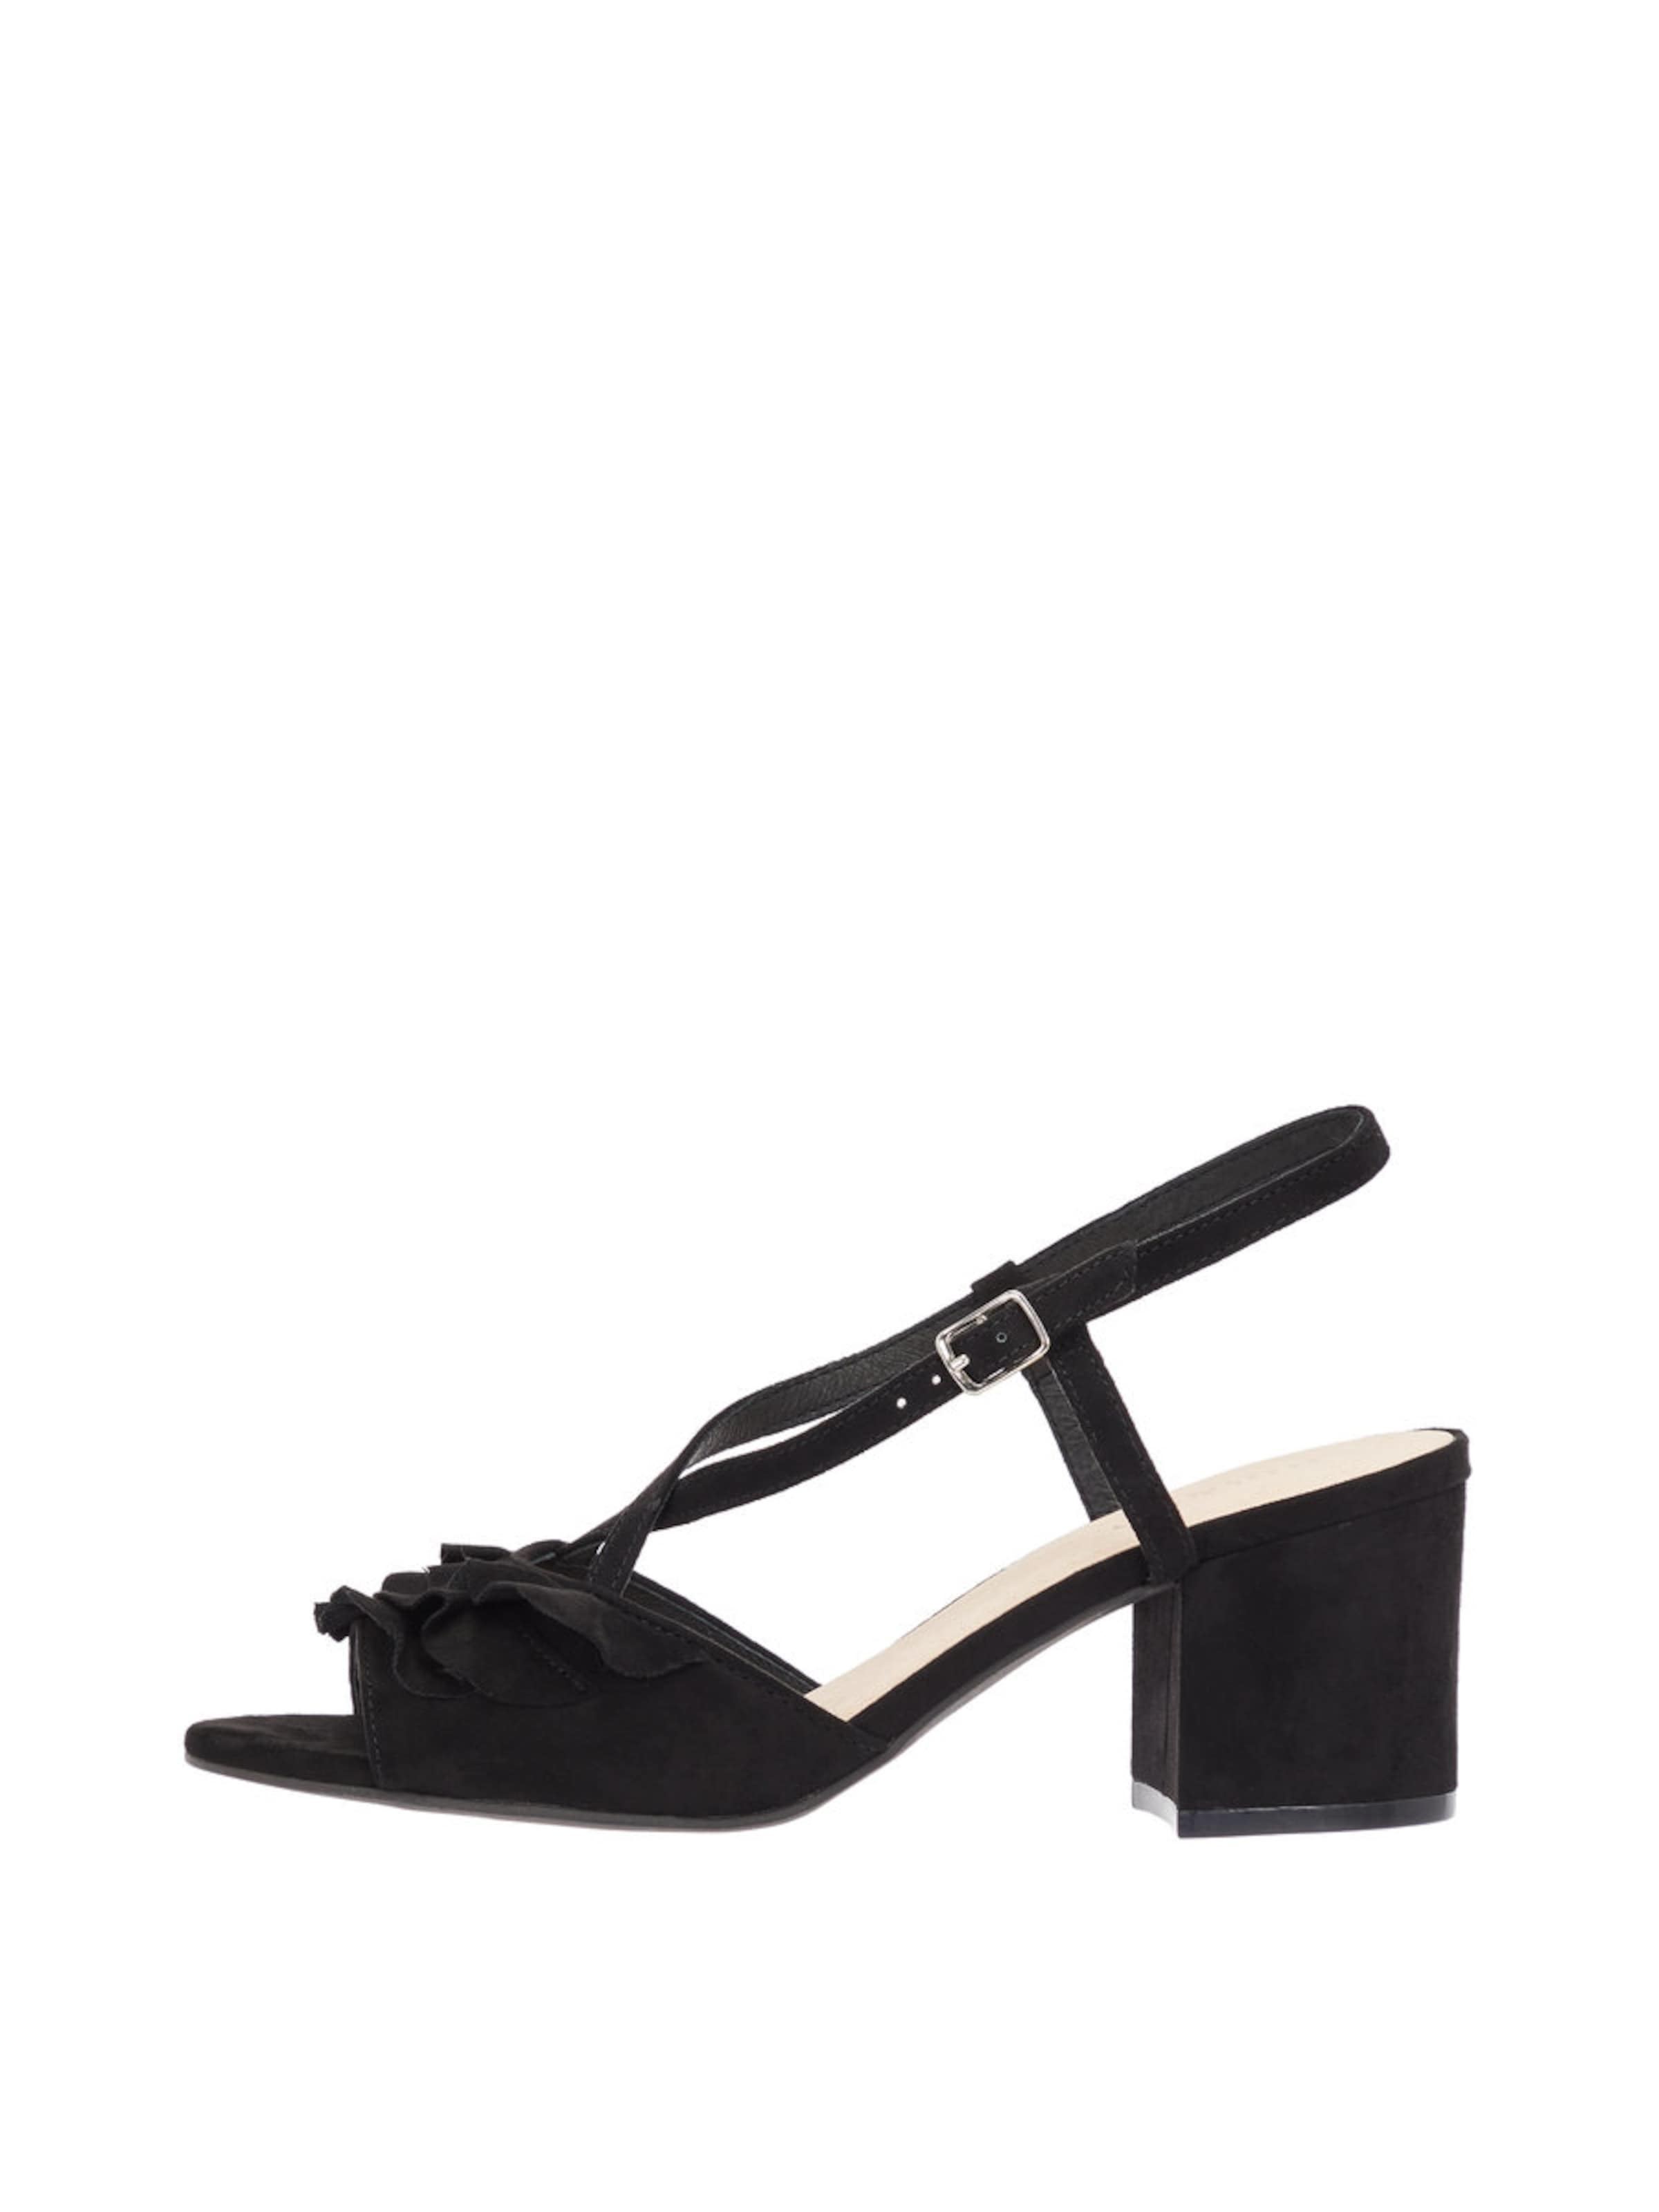 Haltbare Mode billige Schuhe Schuhe billige Bianco | Sandalen Schuhe Gut getragene Schuhe c90141